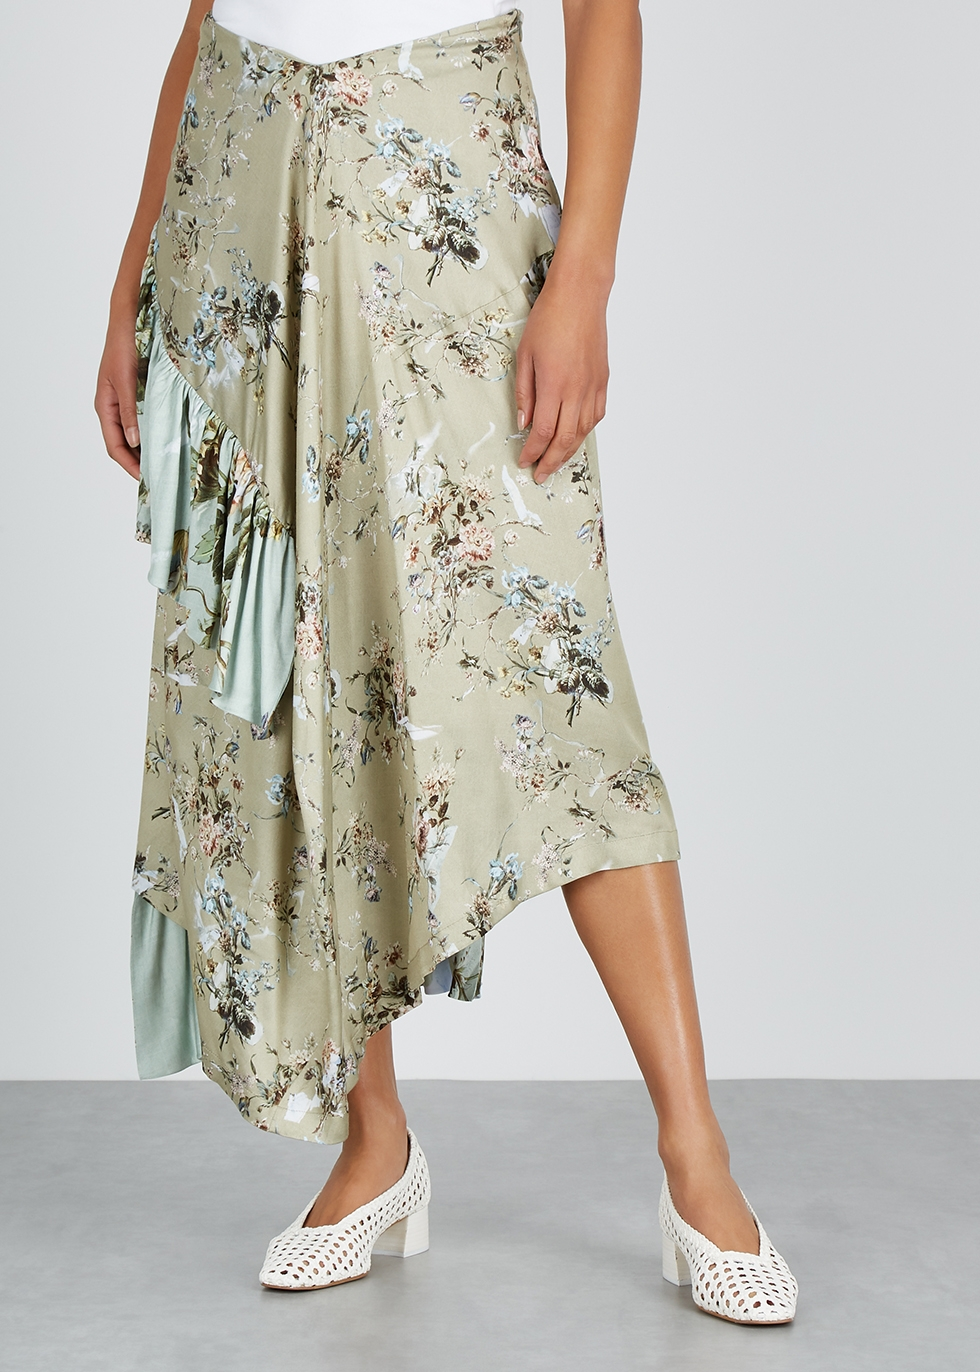 Carmella floral-print satin midi skirt - Preen By Thornton Bregazzi